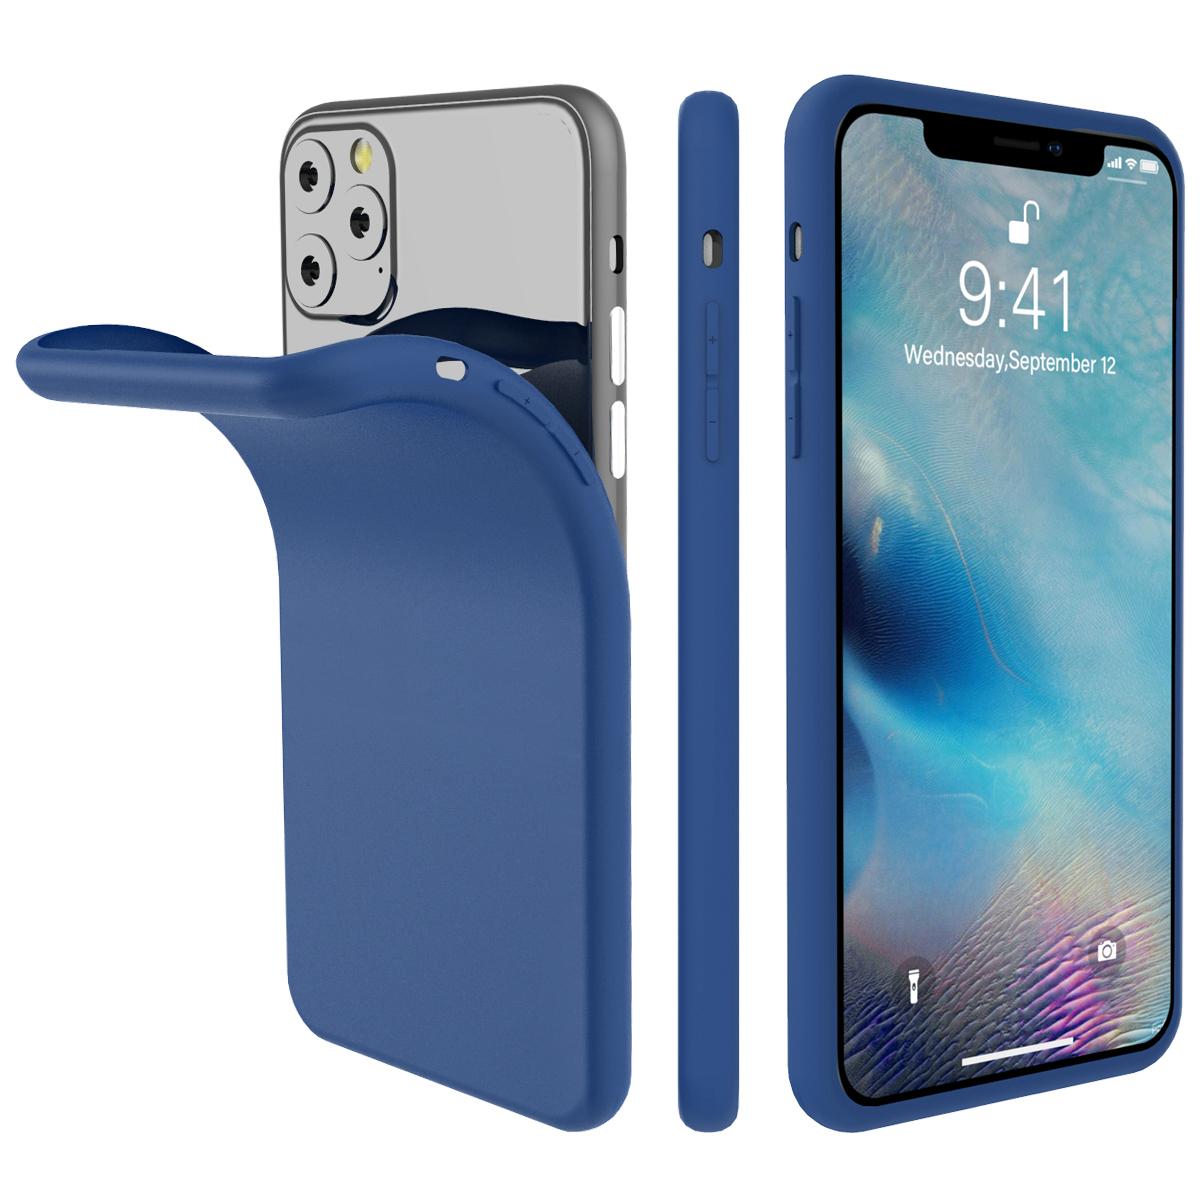 Torubia Silicone Case for iPhone 11/11 Pro/11 Pro Max 112